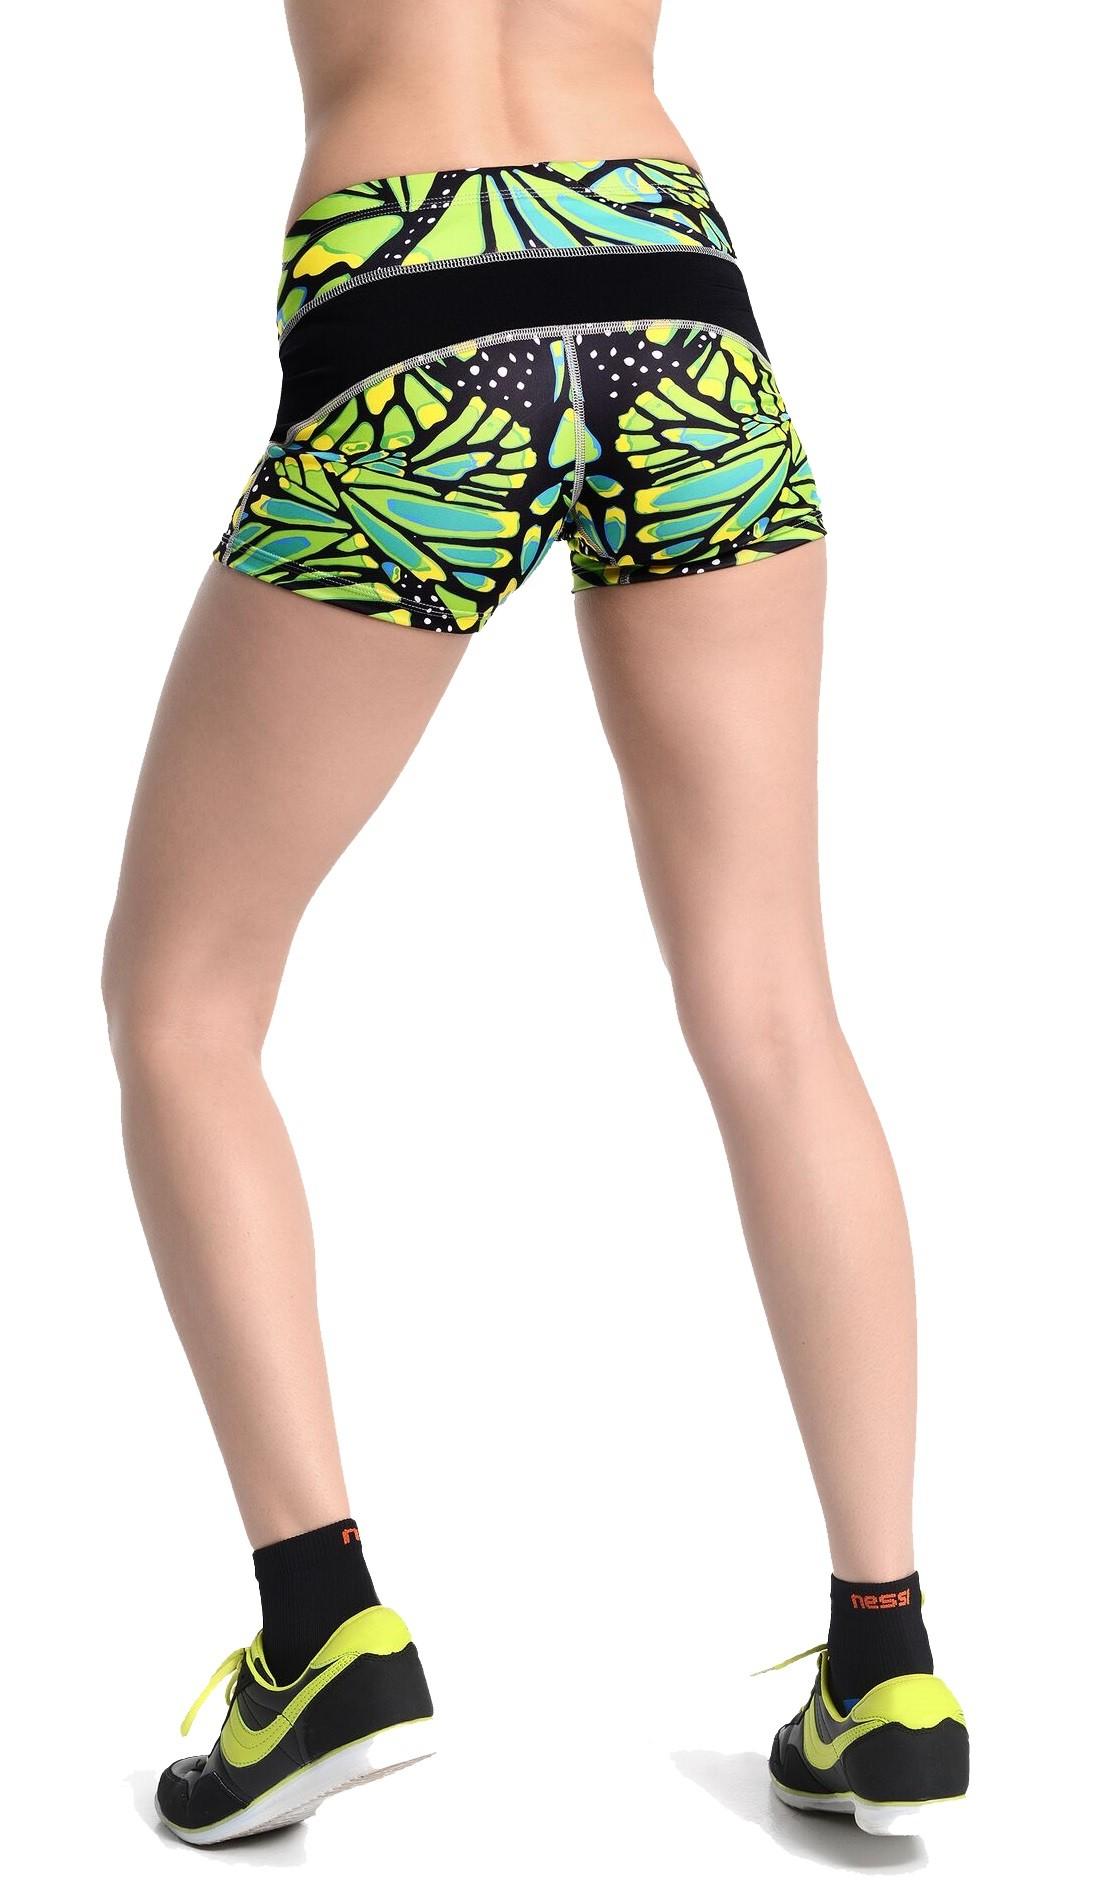 nessi damen shorts oskz laufhose fitnesshose sport. Black Bedroom Furniture Sets. Home Design Ideas